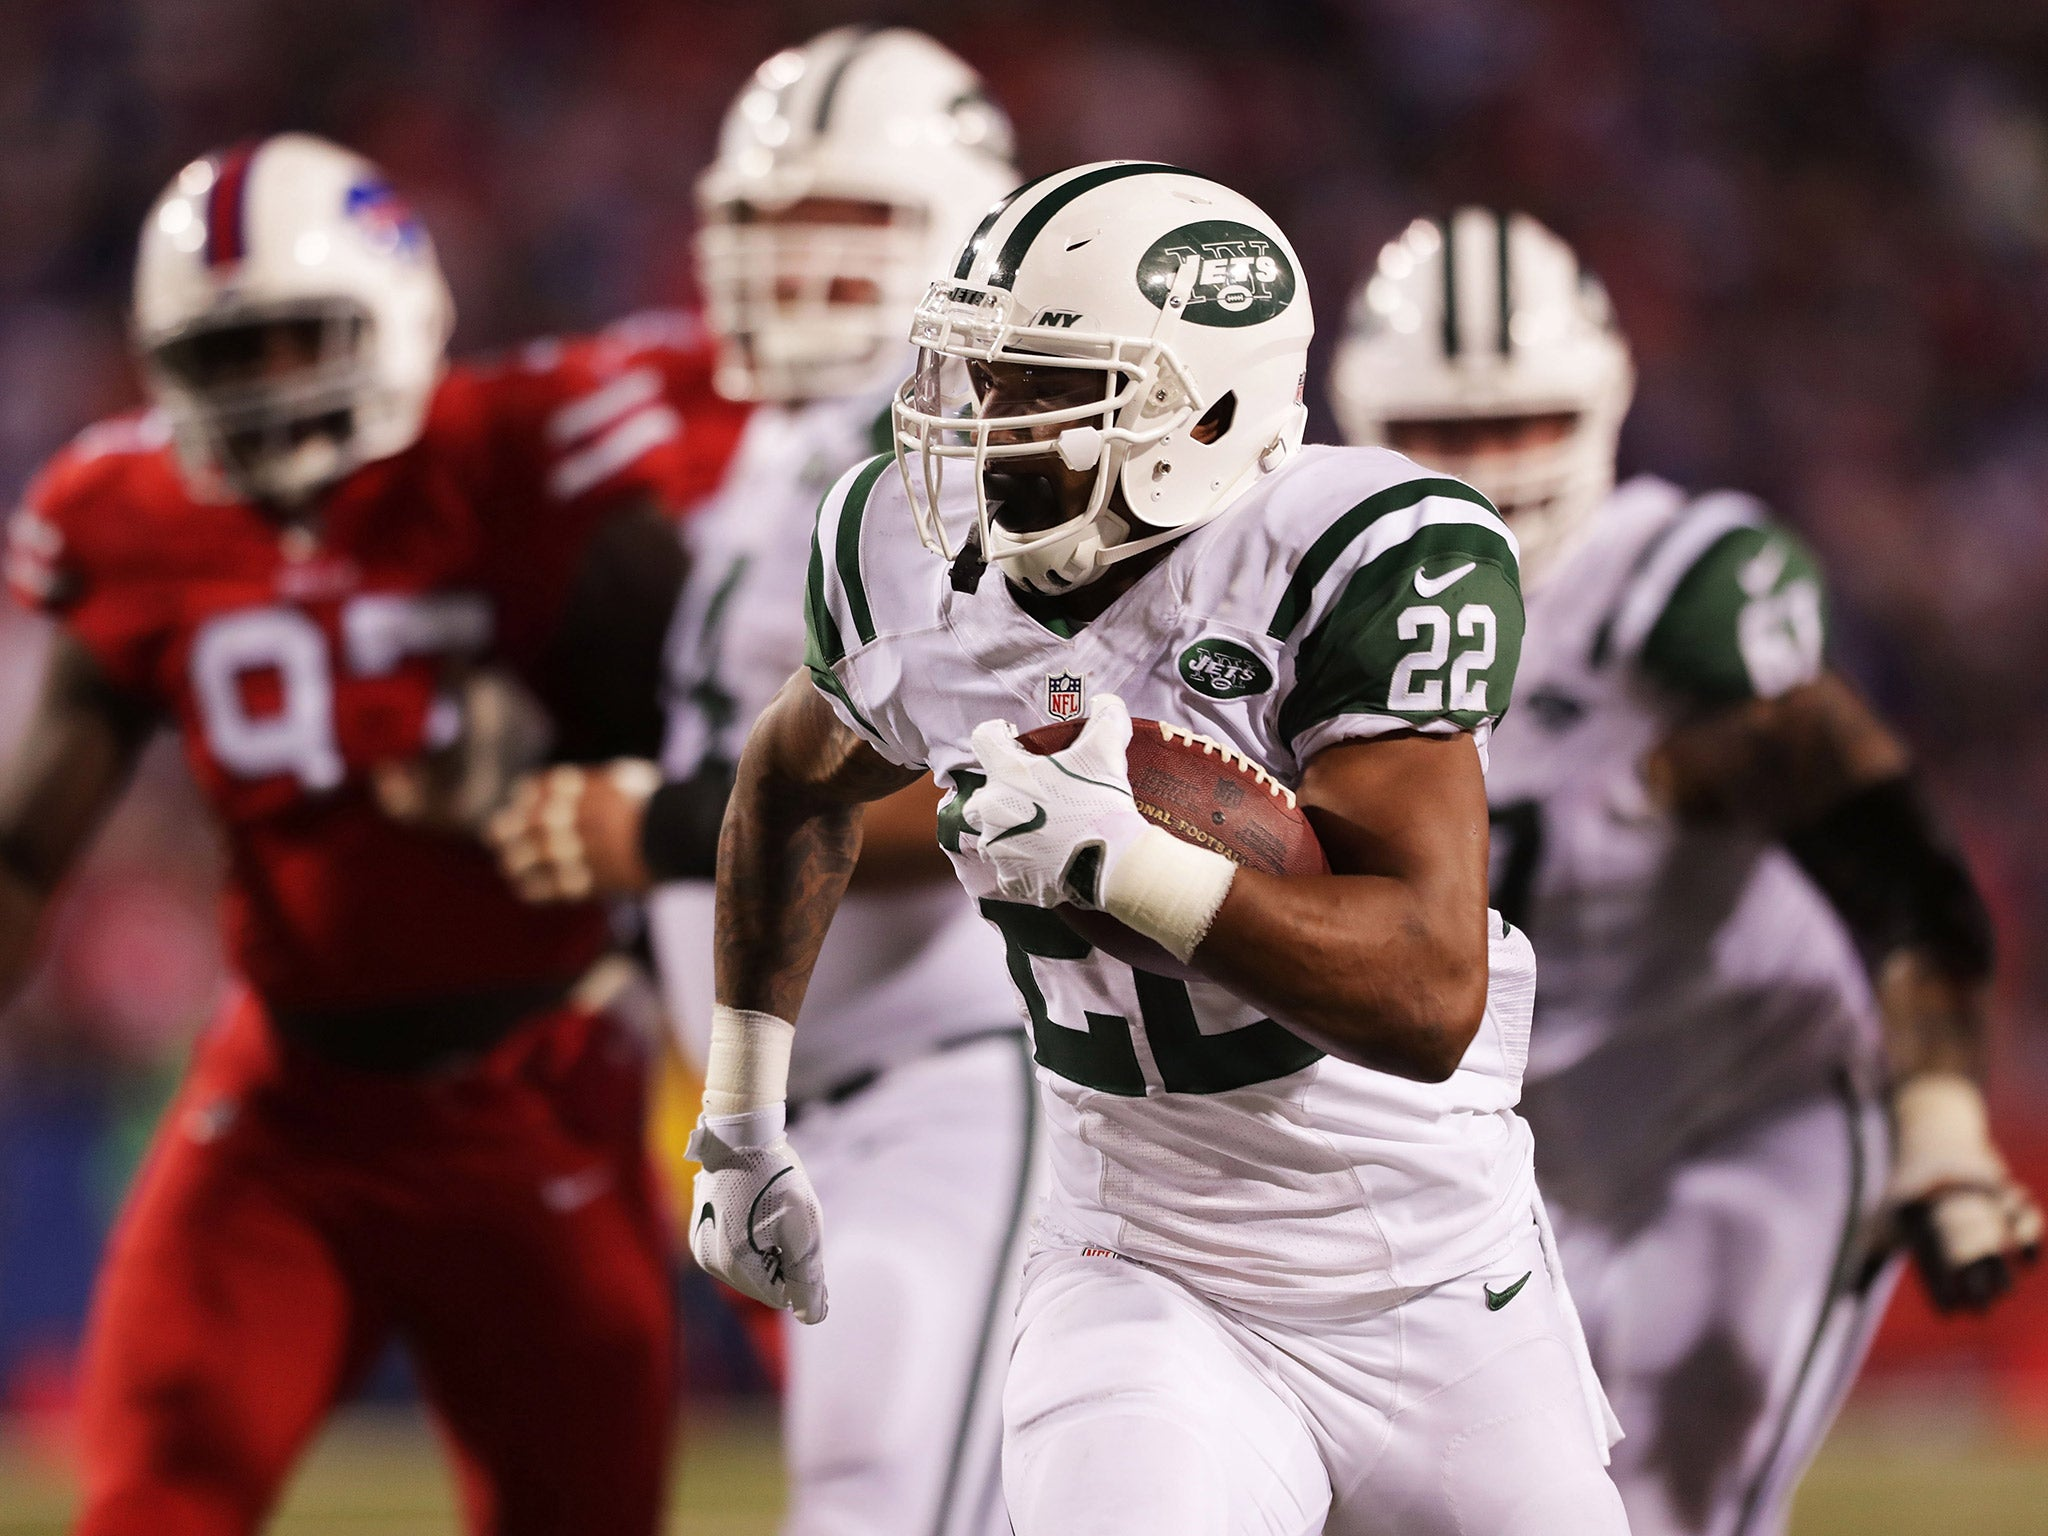 NFL New York Jets Avenge Last Seasons Defeat As Ryan Fitpatrick And Matt Forte Inspire Victory Over Buffalo Bills